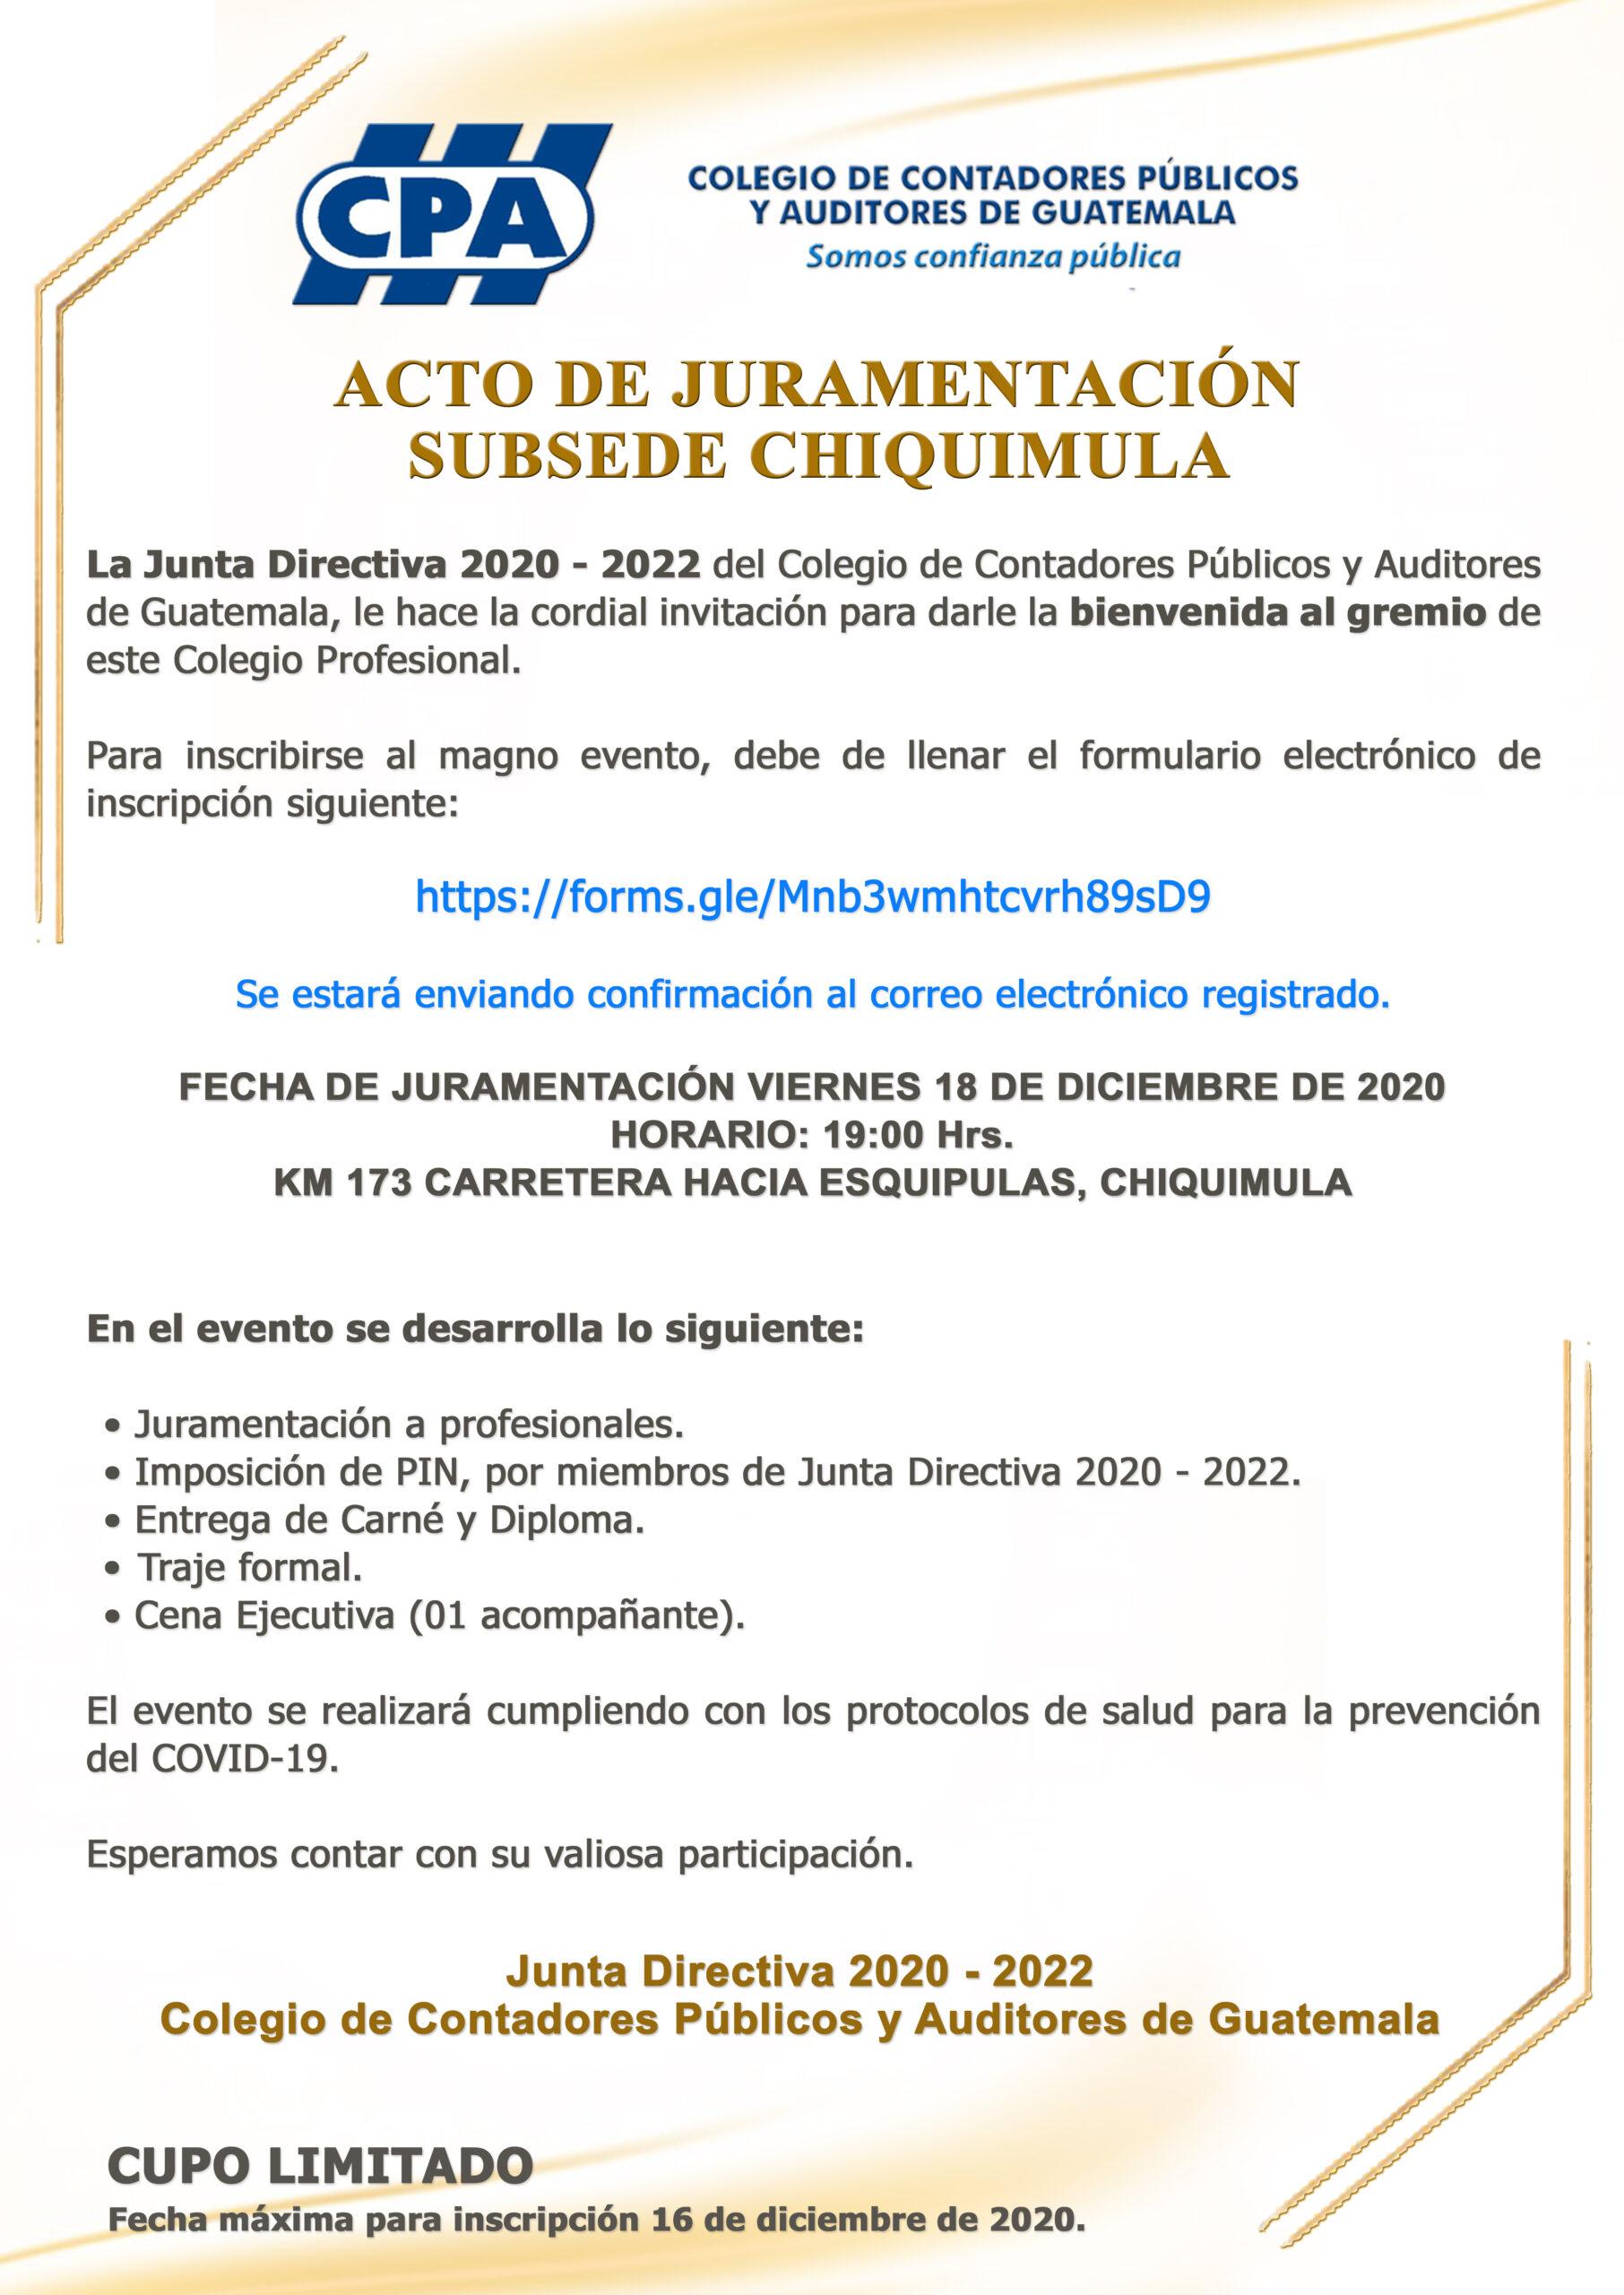 ACTO DE JURAMENTACIÓN | SUBSEDE CHIQUIMULA